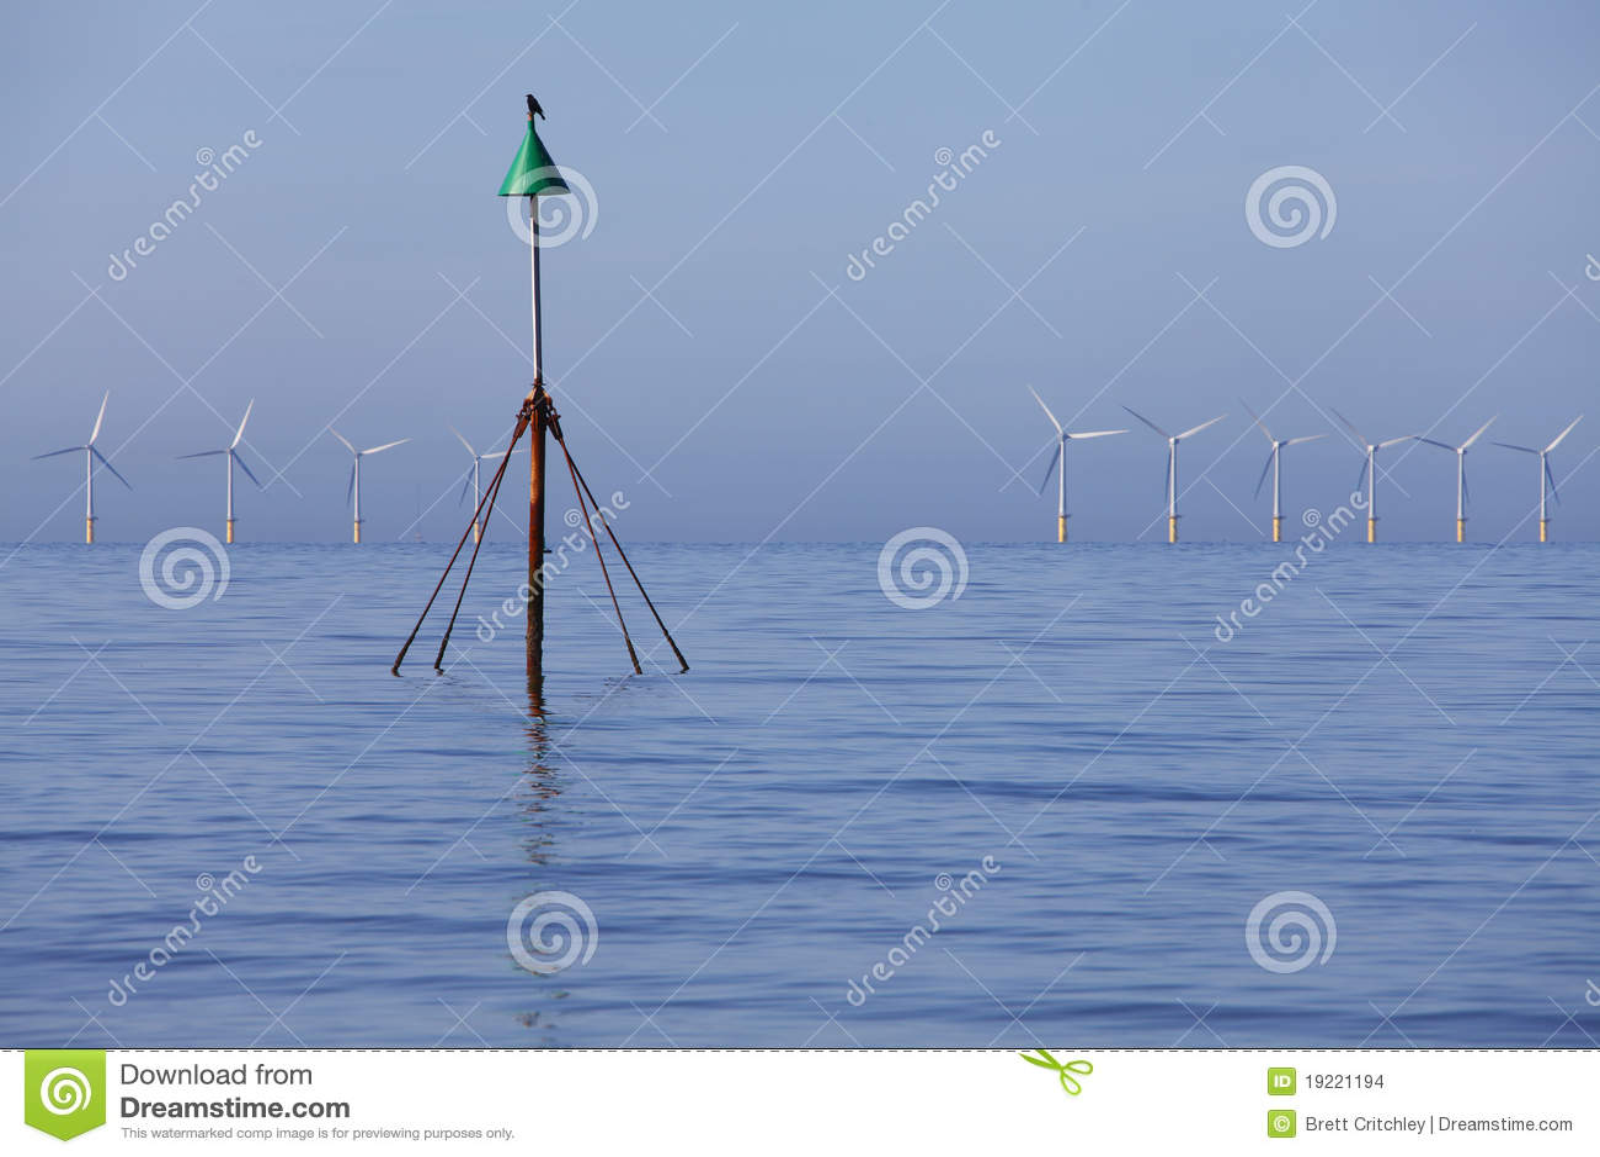 Wind power eco energy